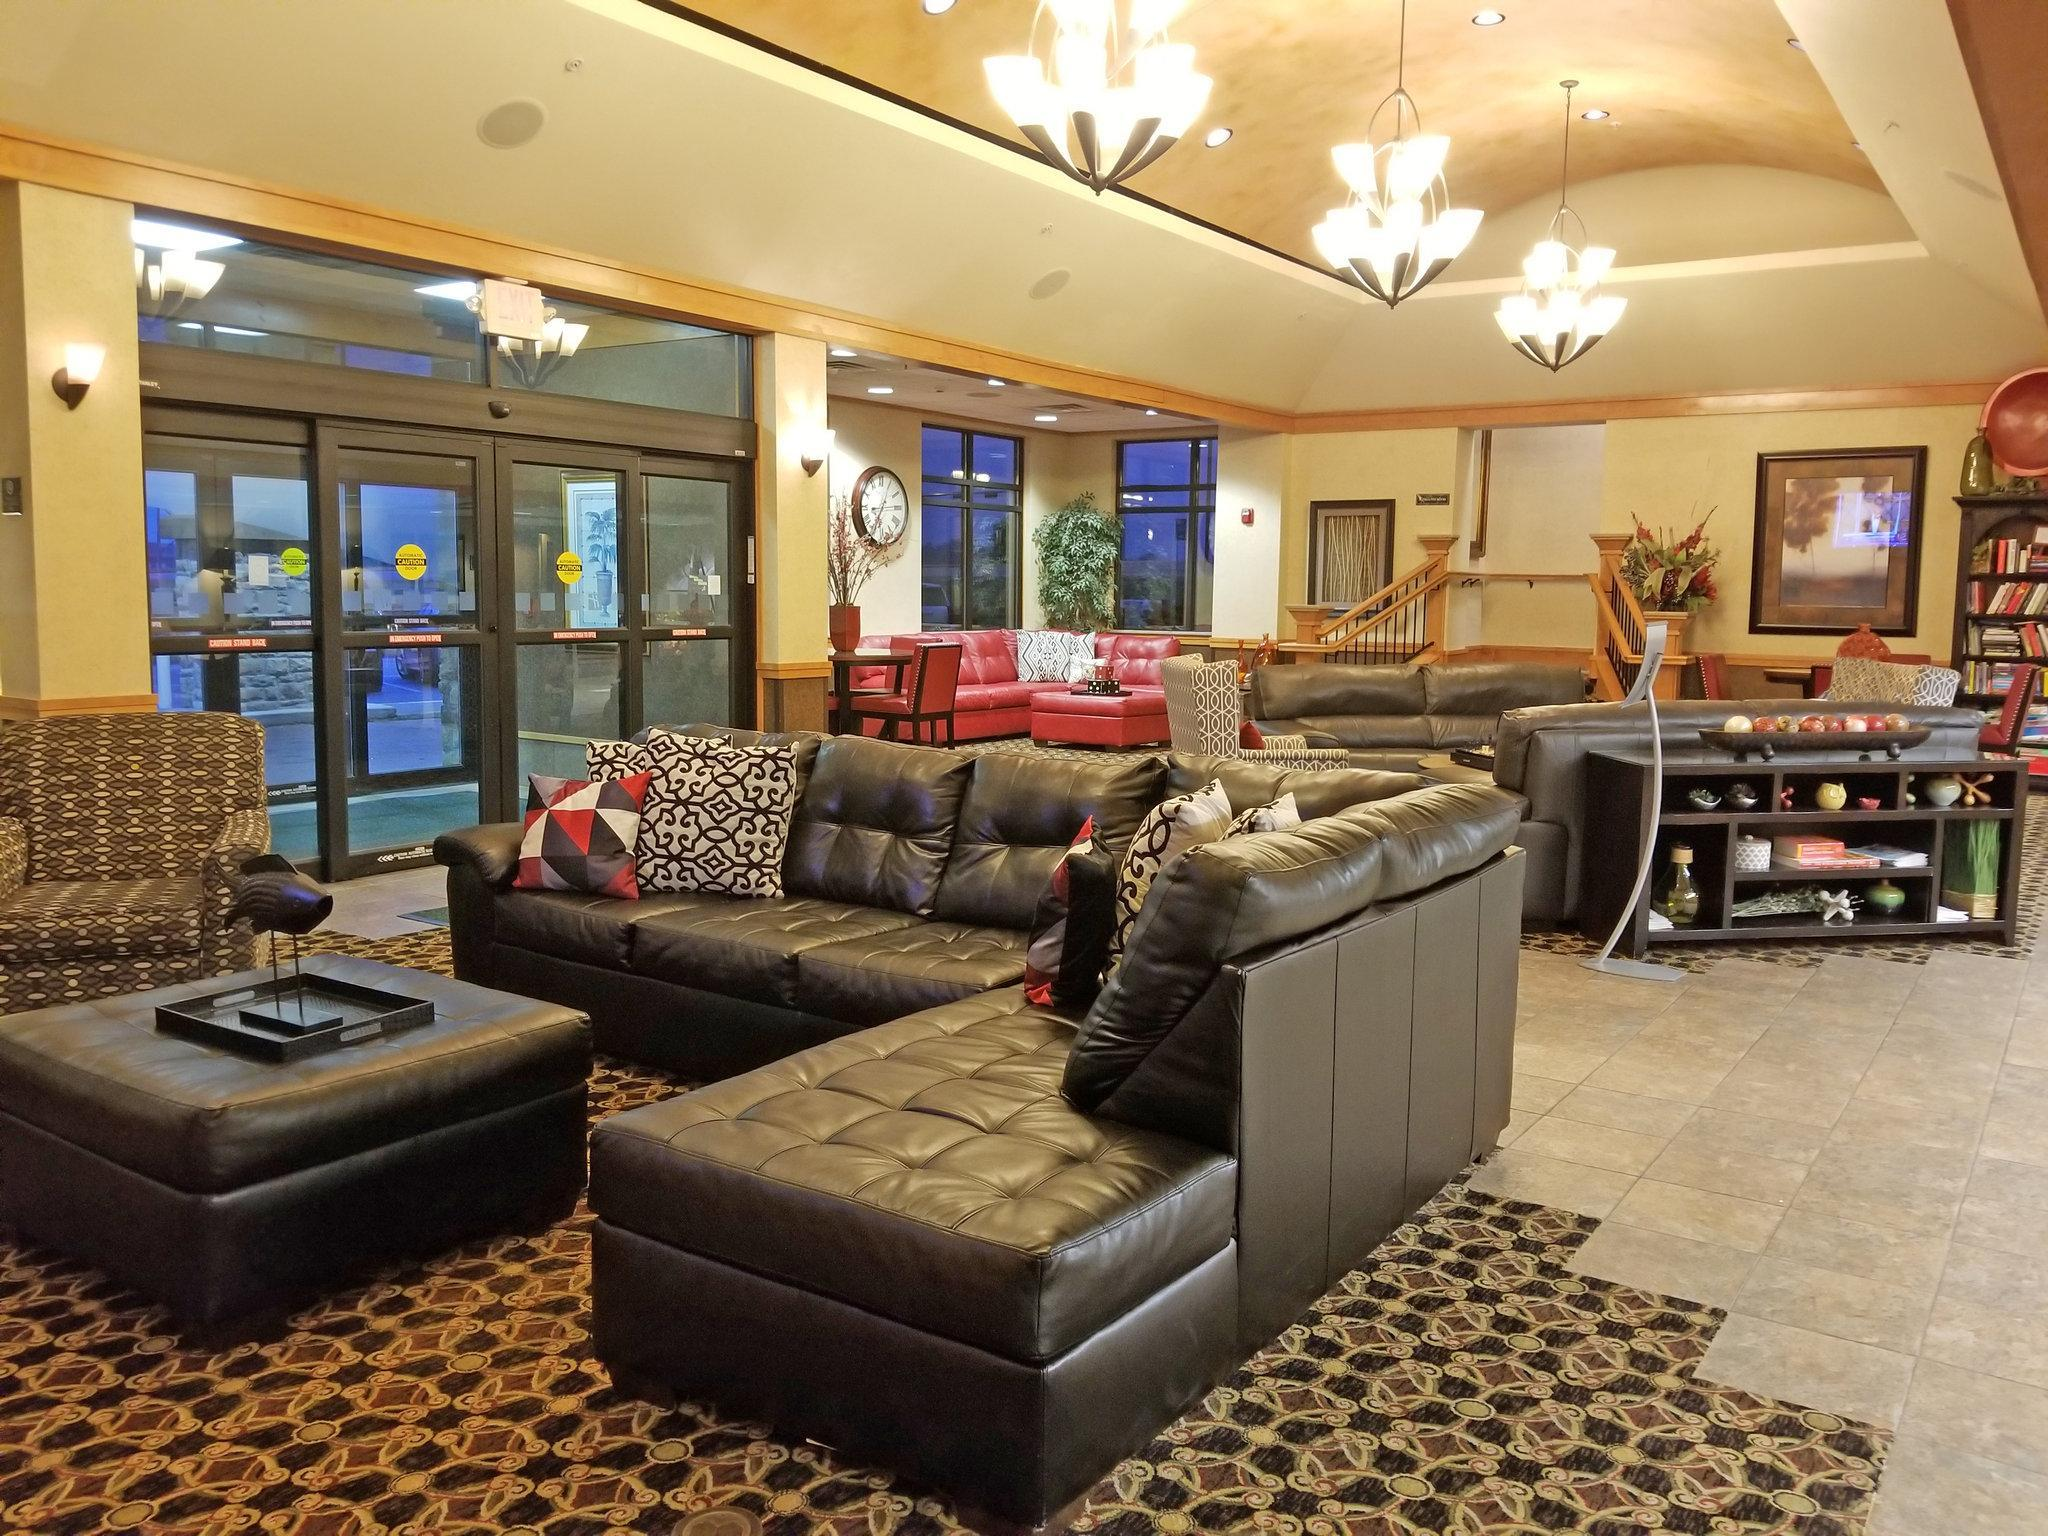 Holiday Inn Kearney, Buffalo